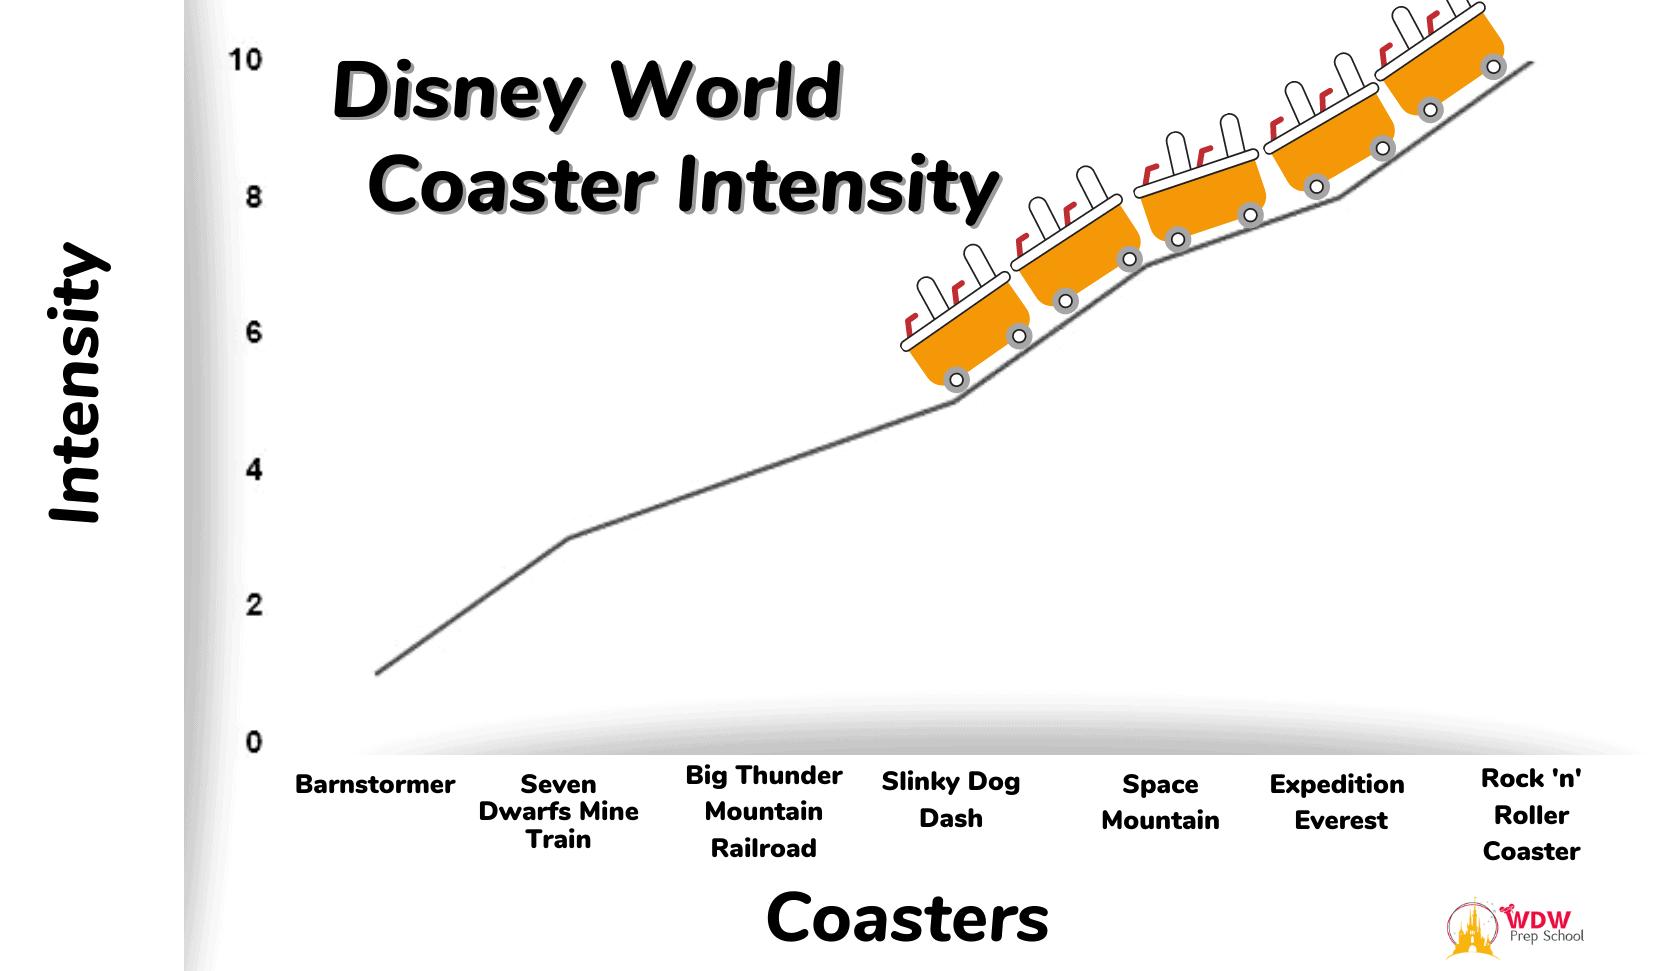 Coaster Intensity chart